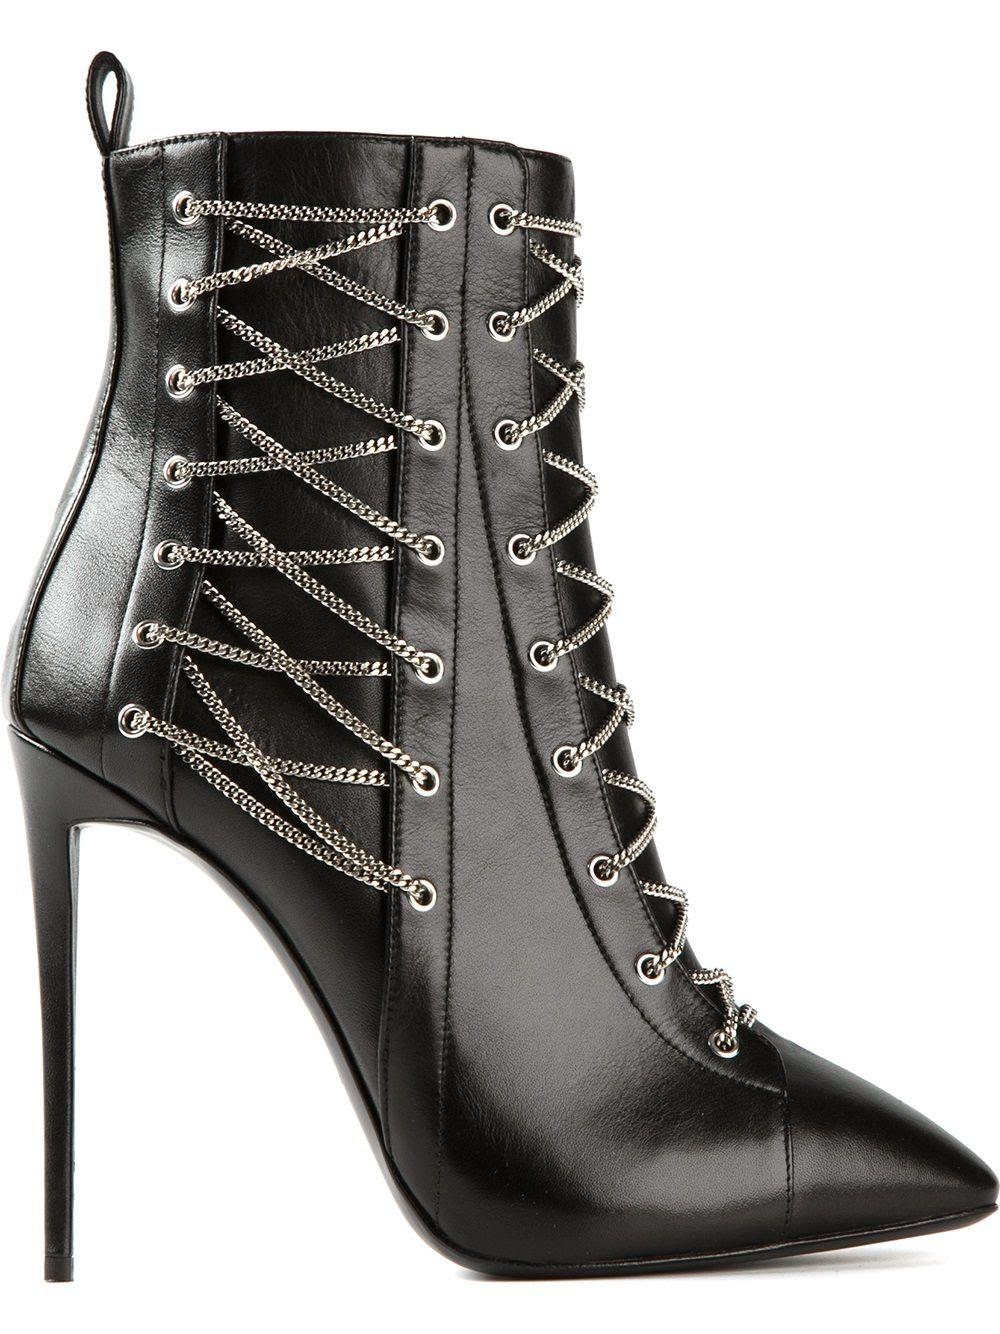 Giuseppe Zanotti Design chain embellished boots